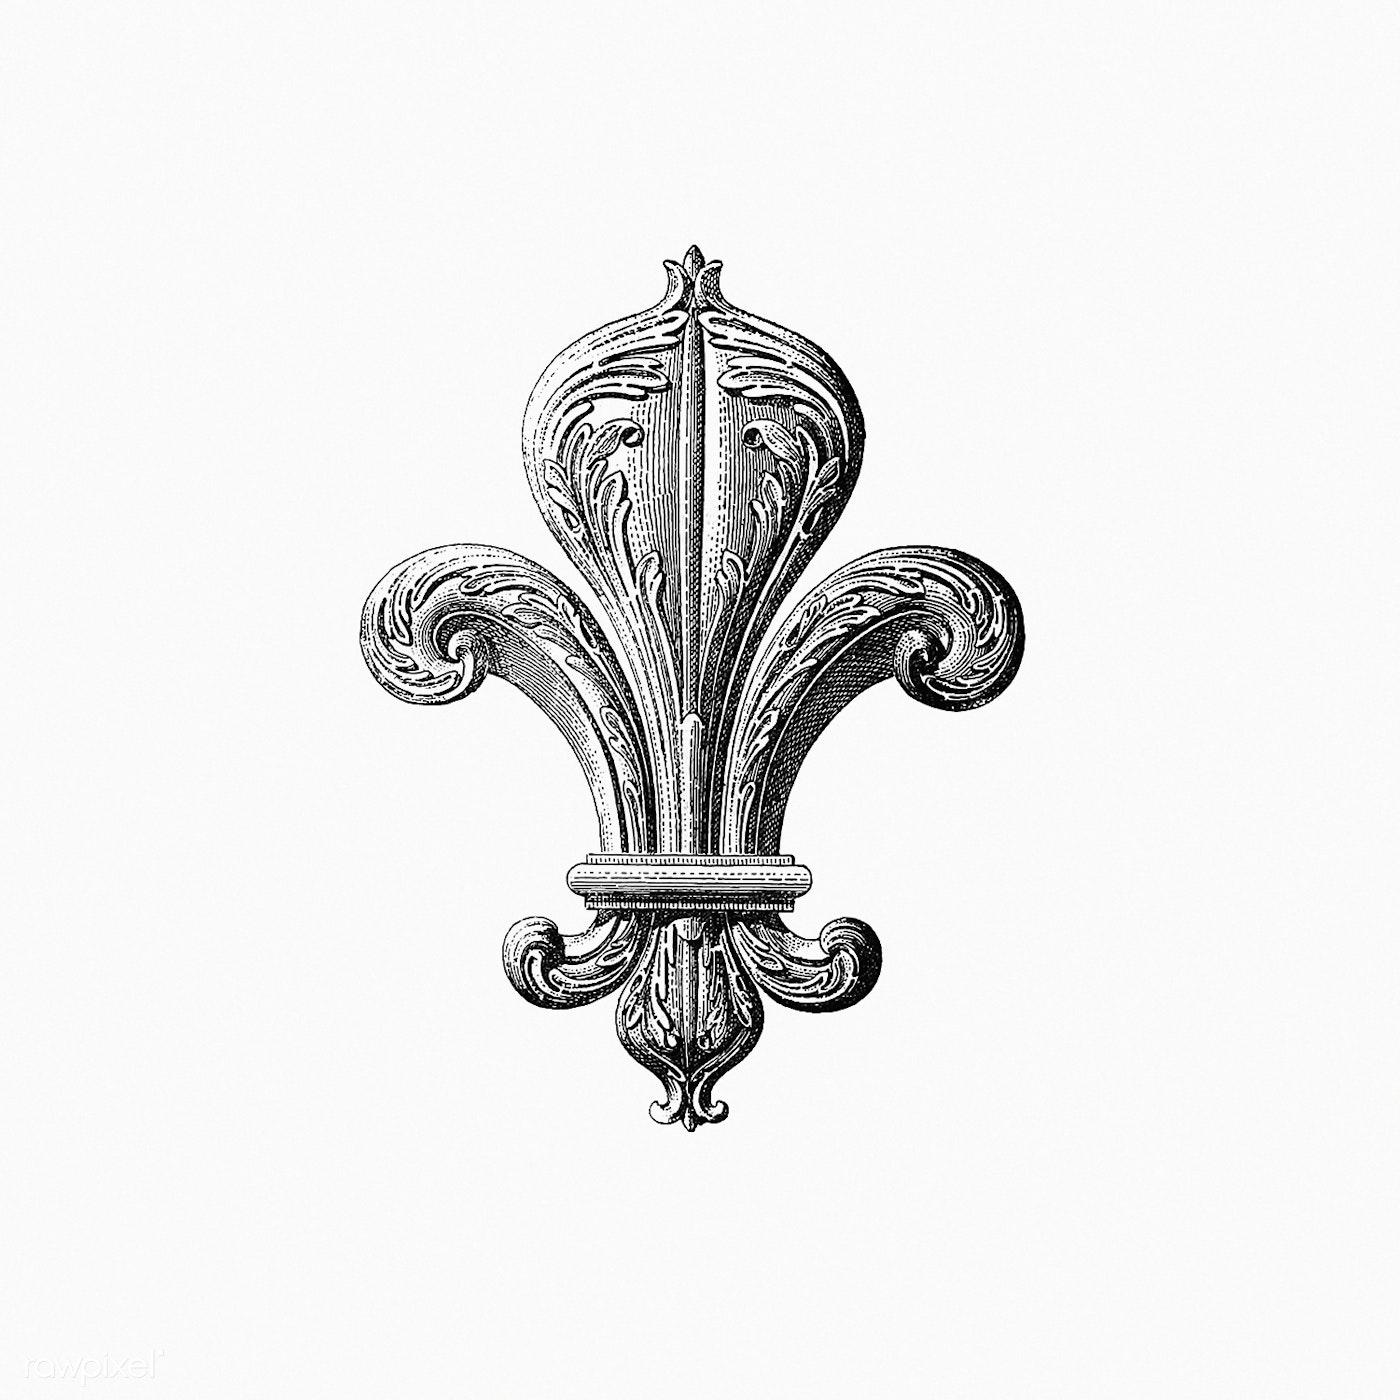 Download Premium Illustration Of Drawing Of A Fleur De Lys 571703